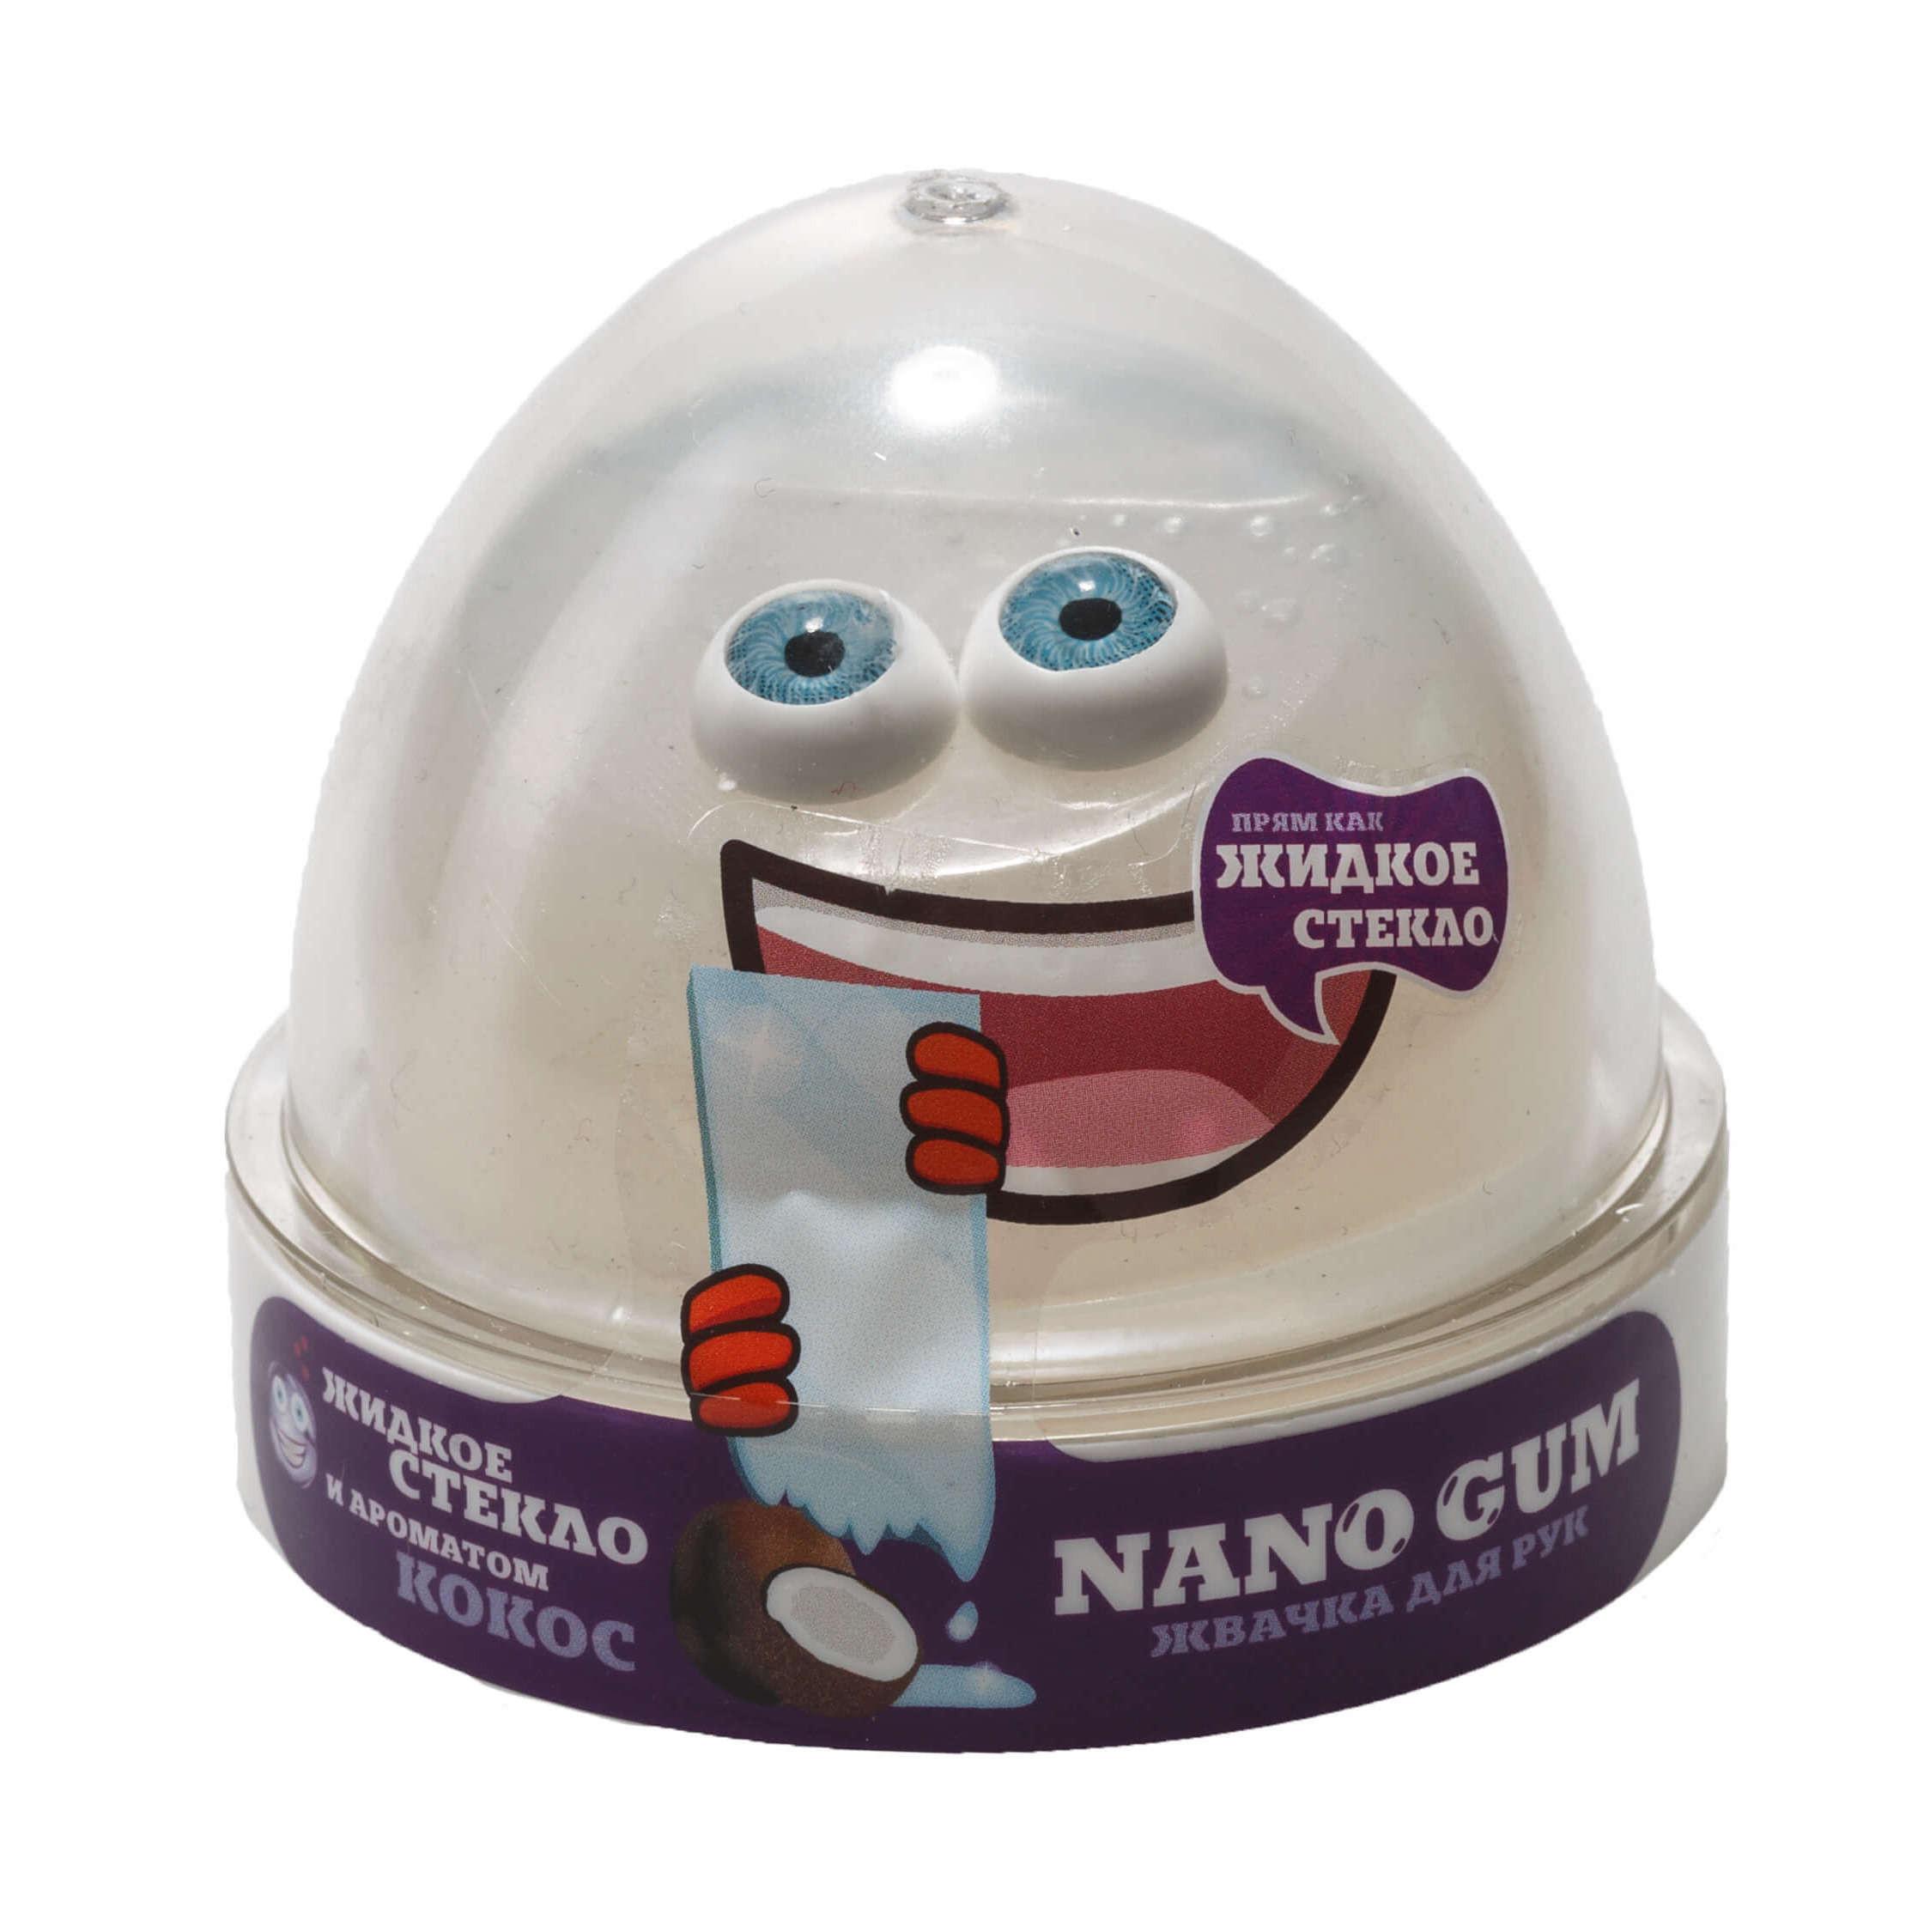 Nano gum, Жидкое стекло с ароматом Кокоса